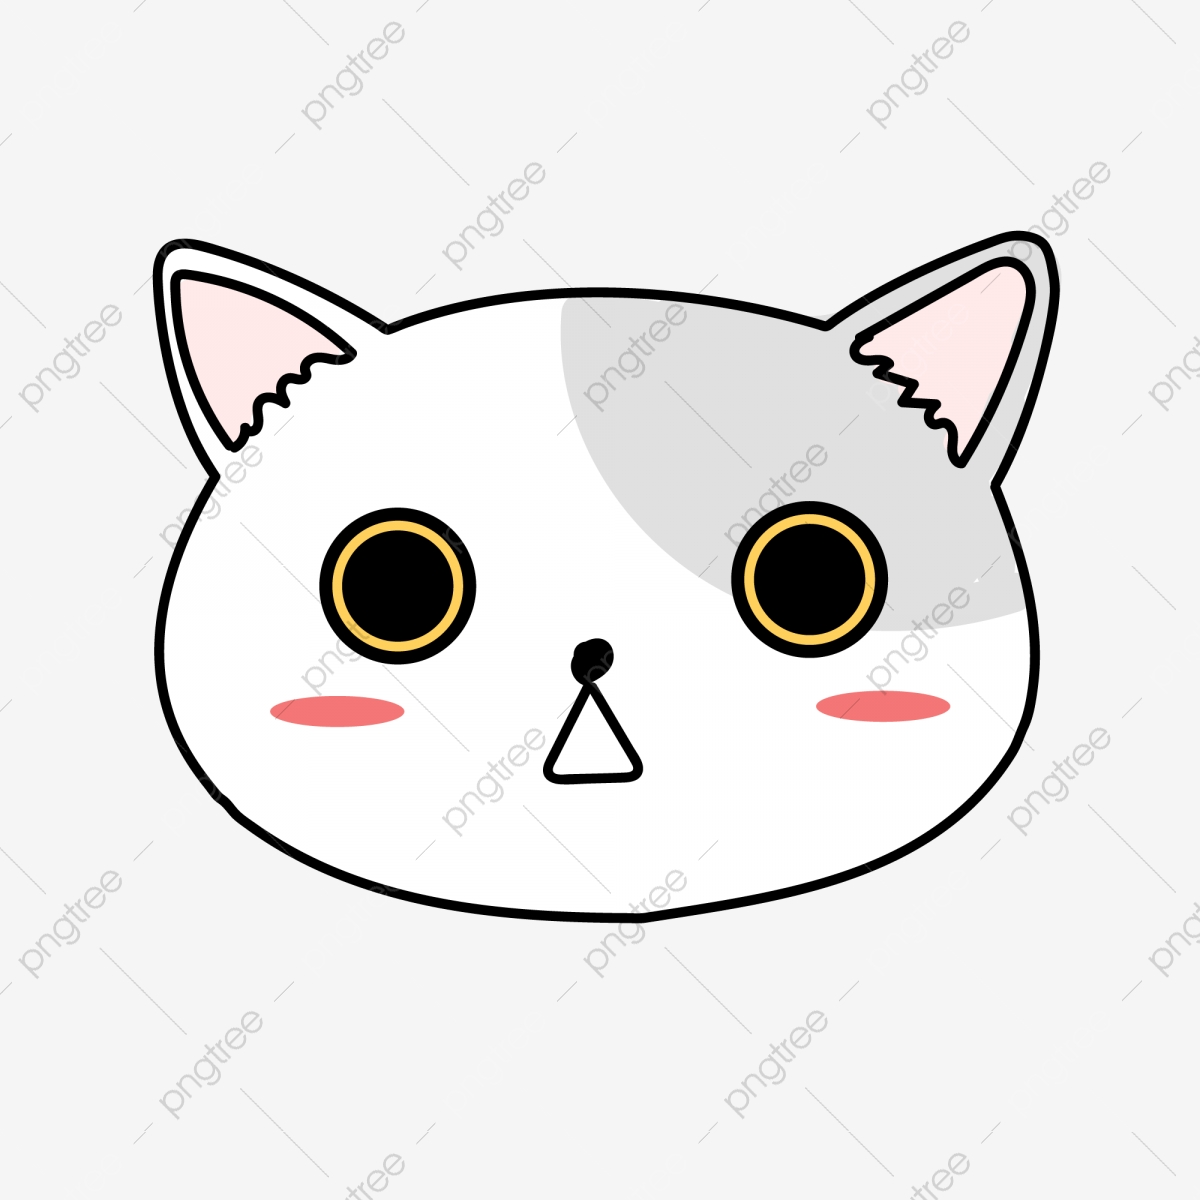 Kartun El Batang Angka Kucing Kepala Elemen Ungkapan